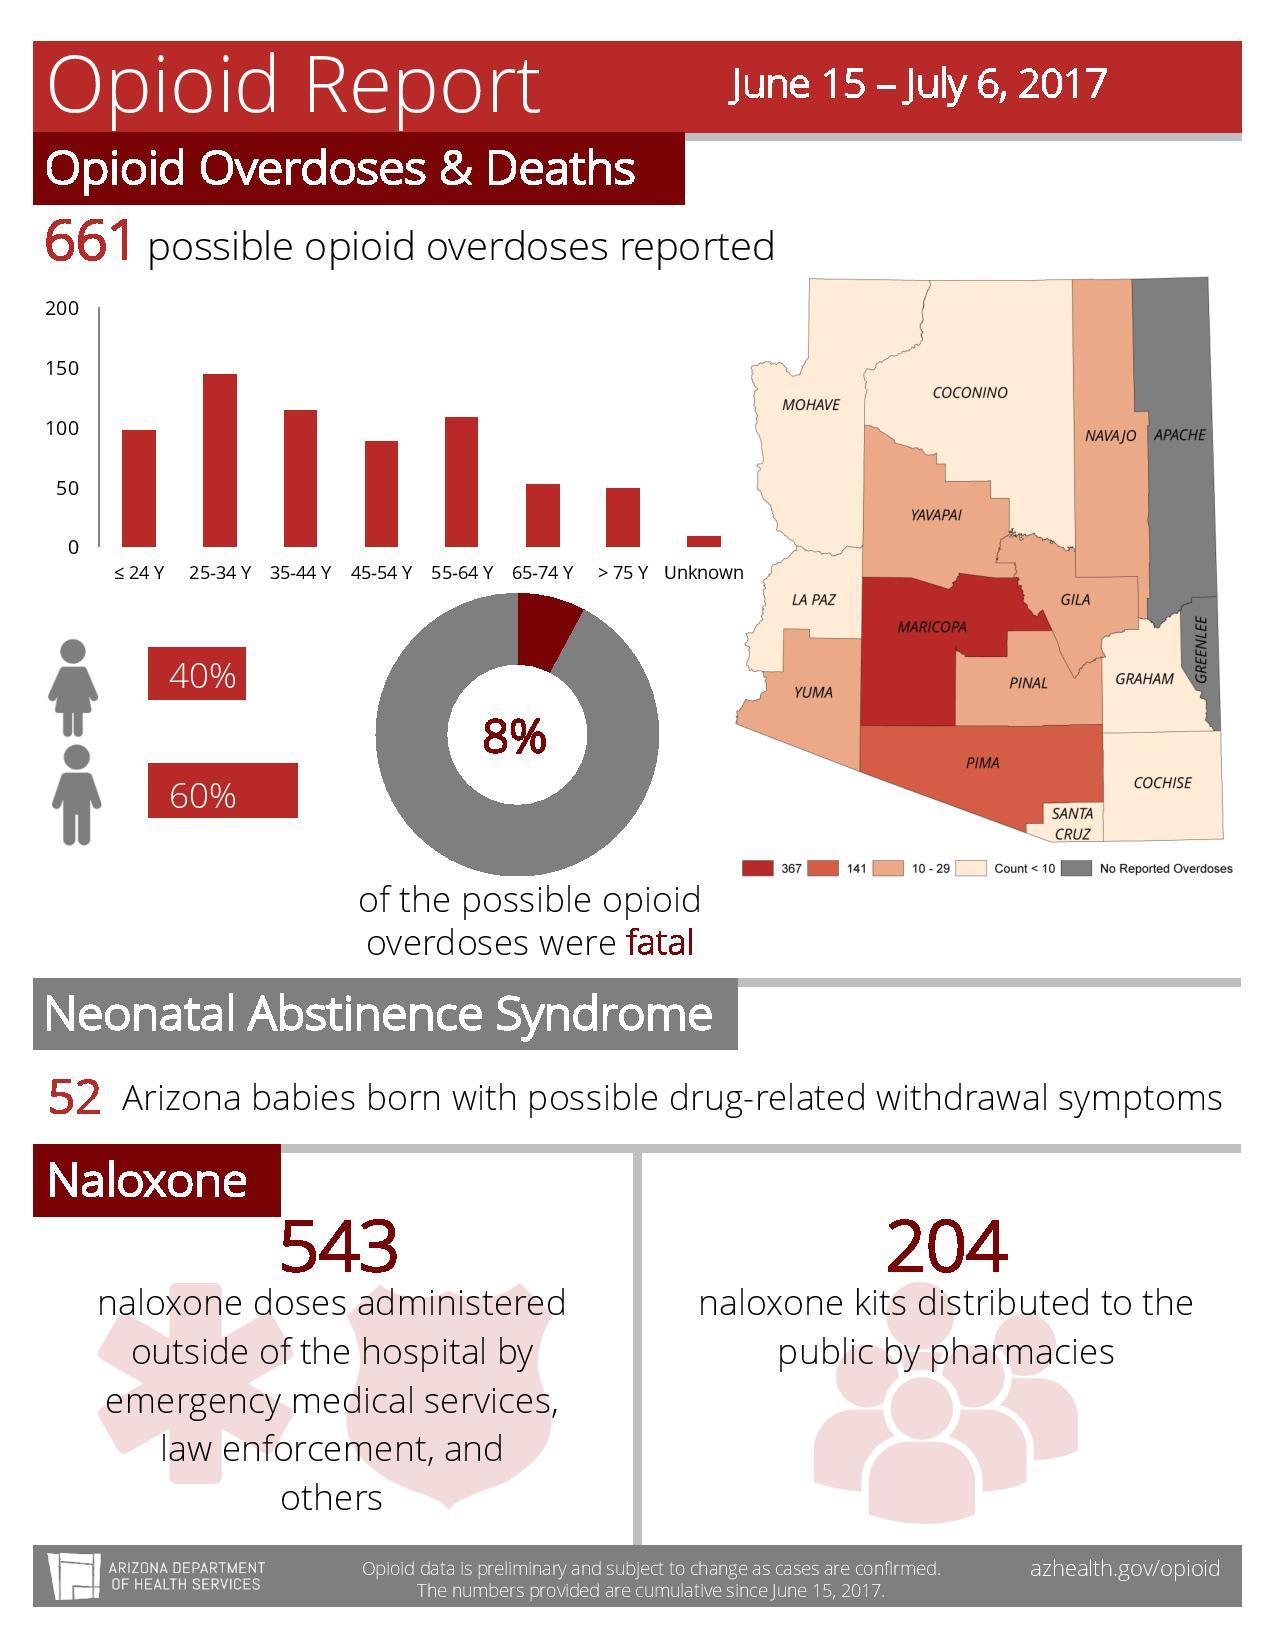 Real time data on Arizona opioid crisis (Source: Arizona Department of Health Services)